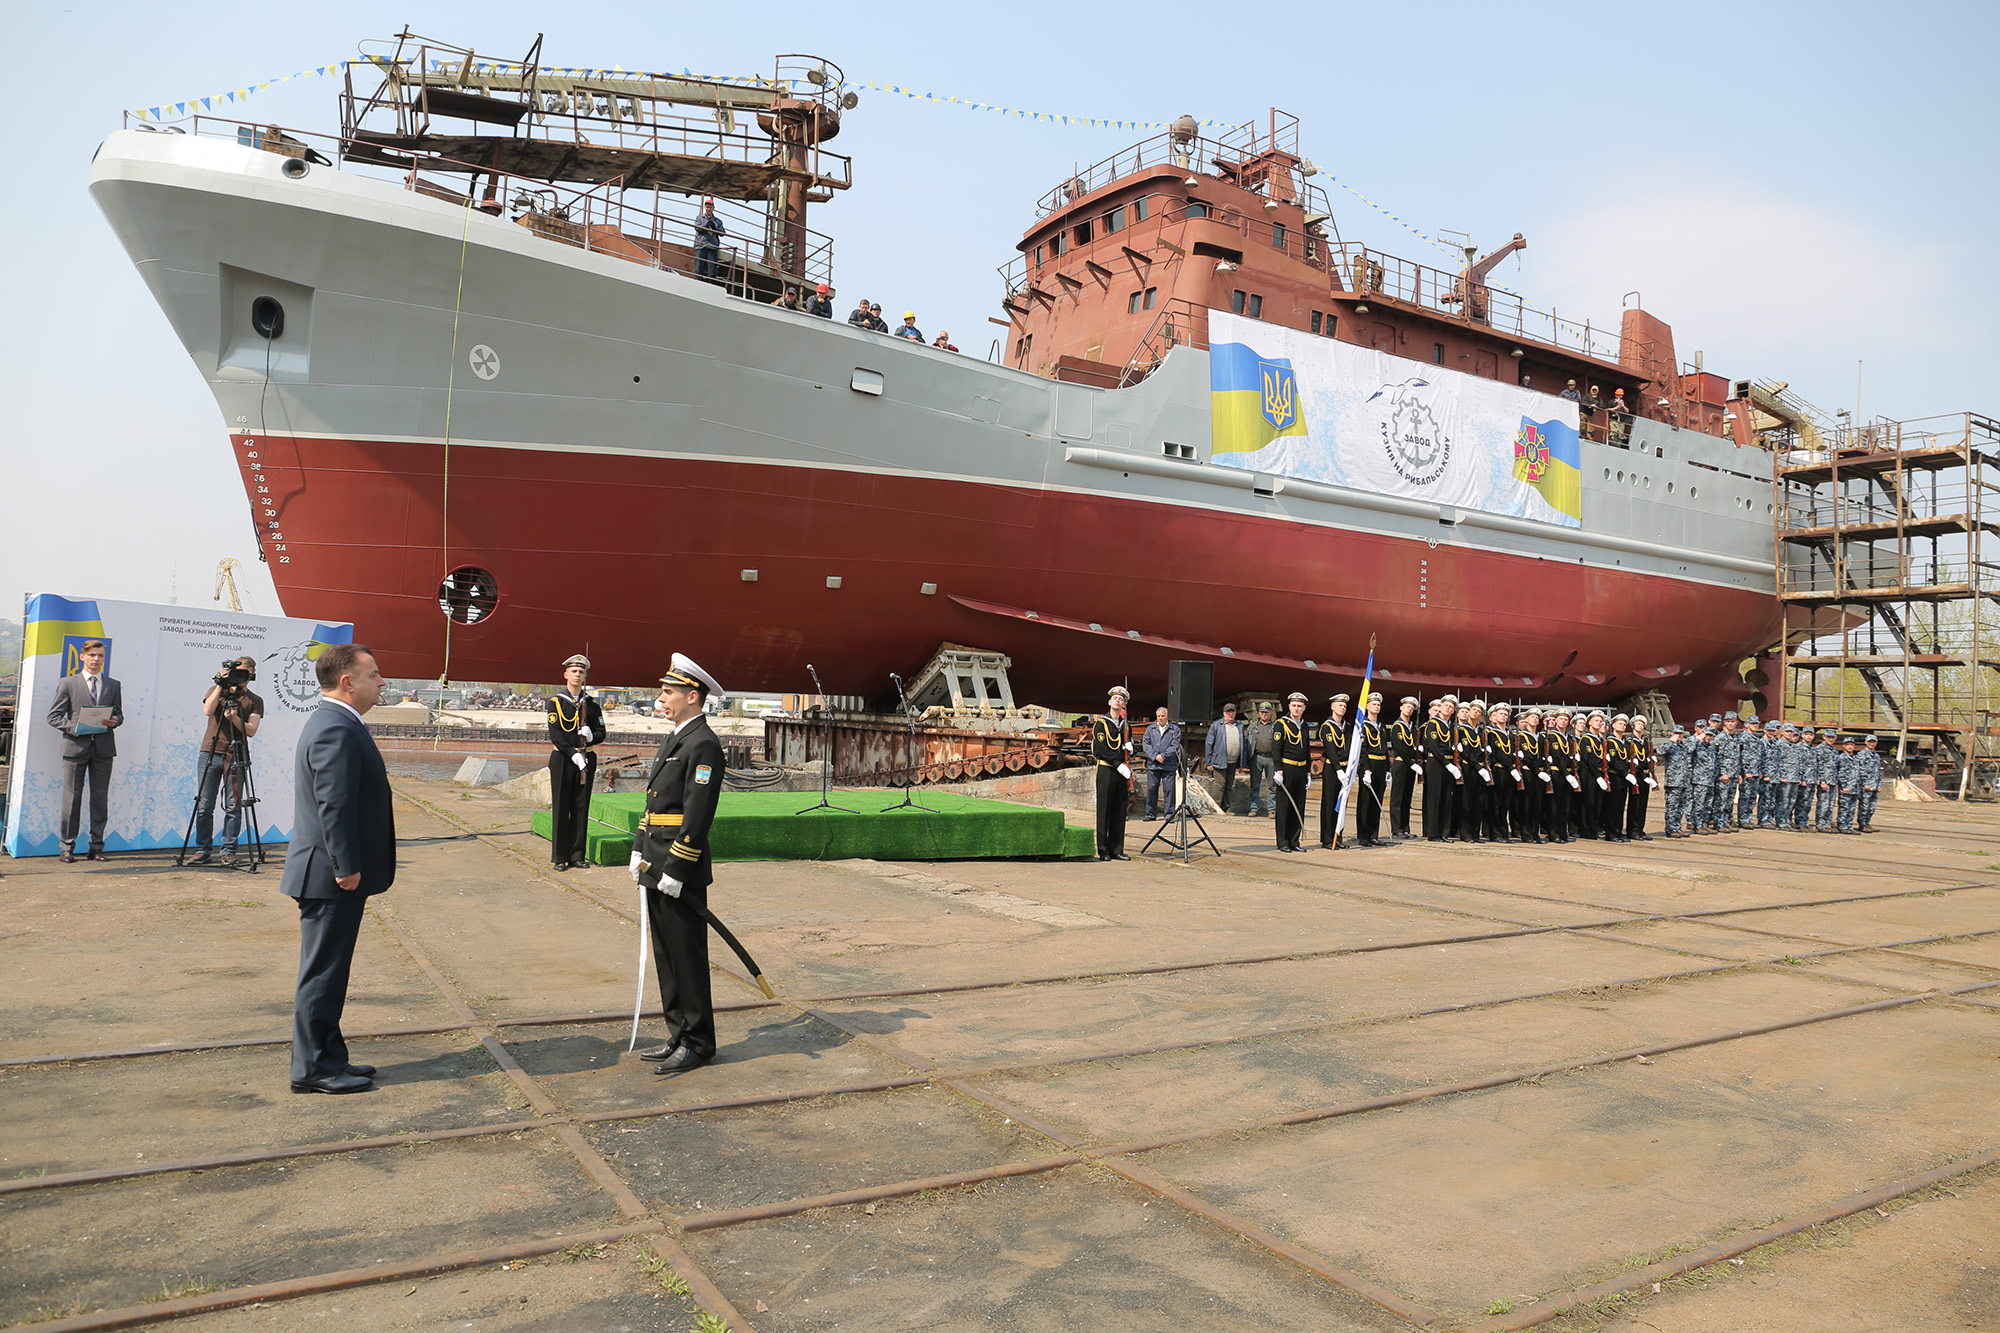 A new reinforcement for the Ukrainian Navy: New ship